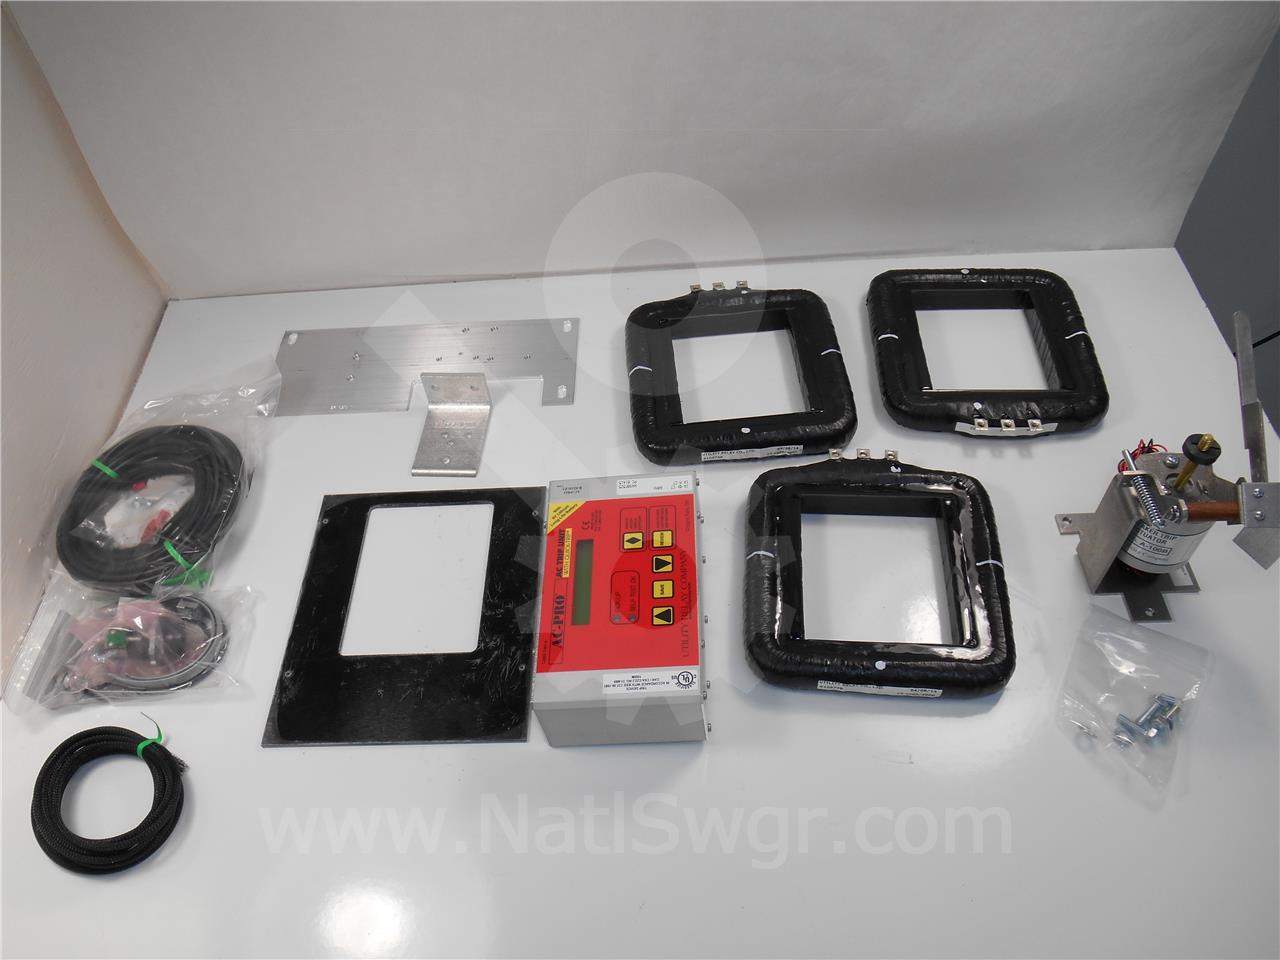 URC AC PRO SOLID STATE RETROFIT KIT - National Switchgear